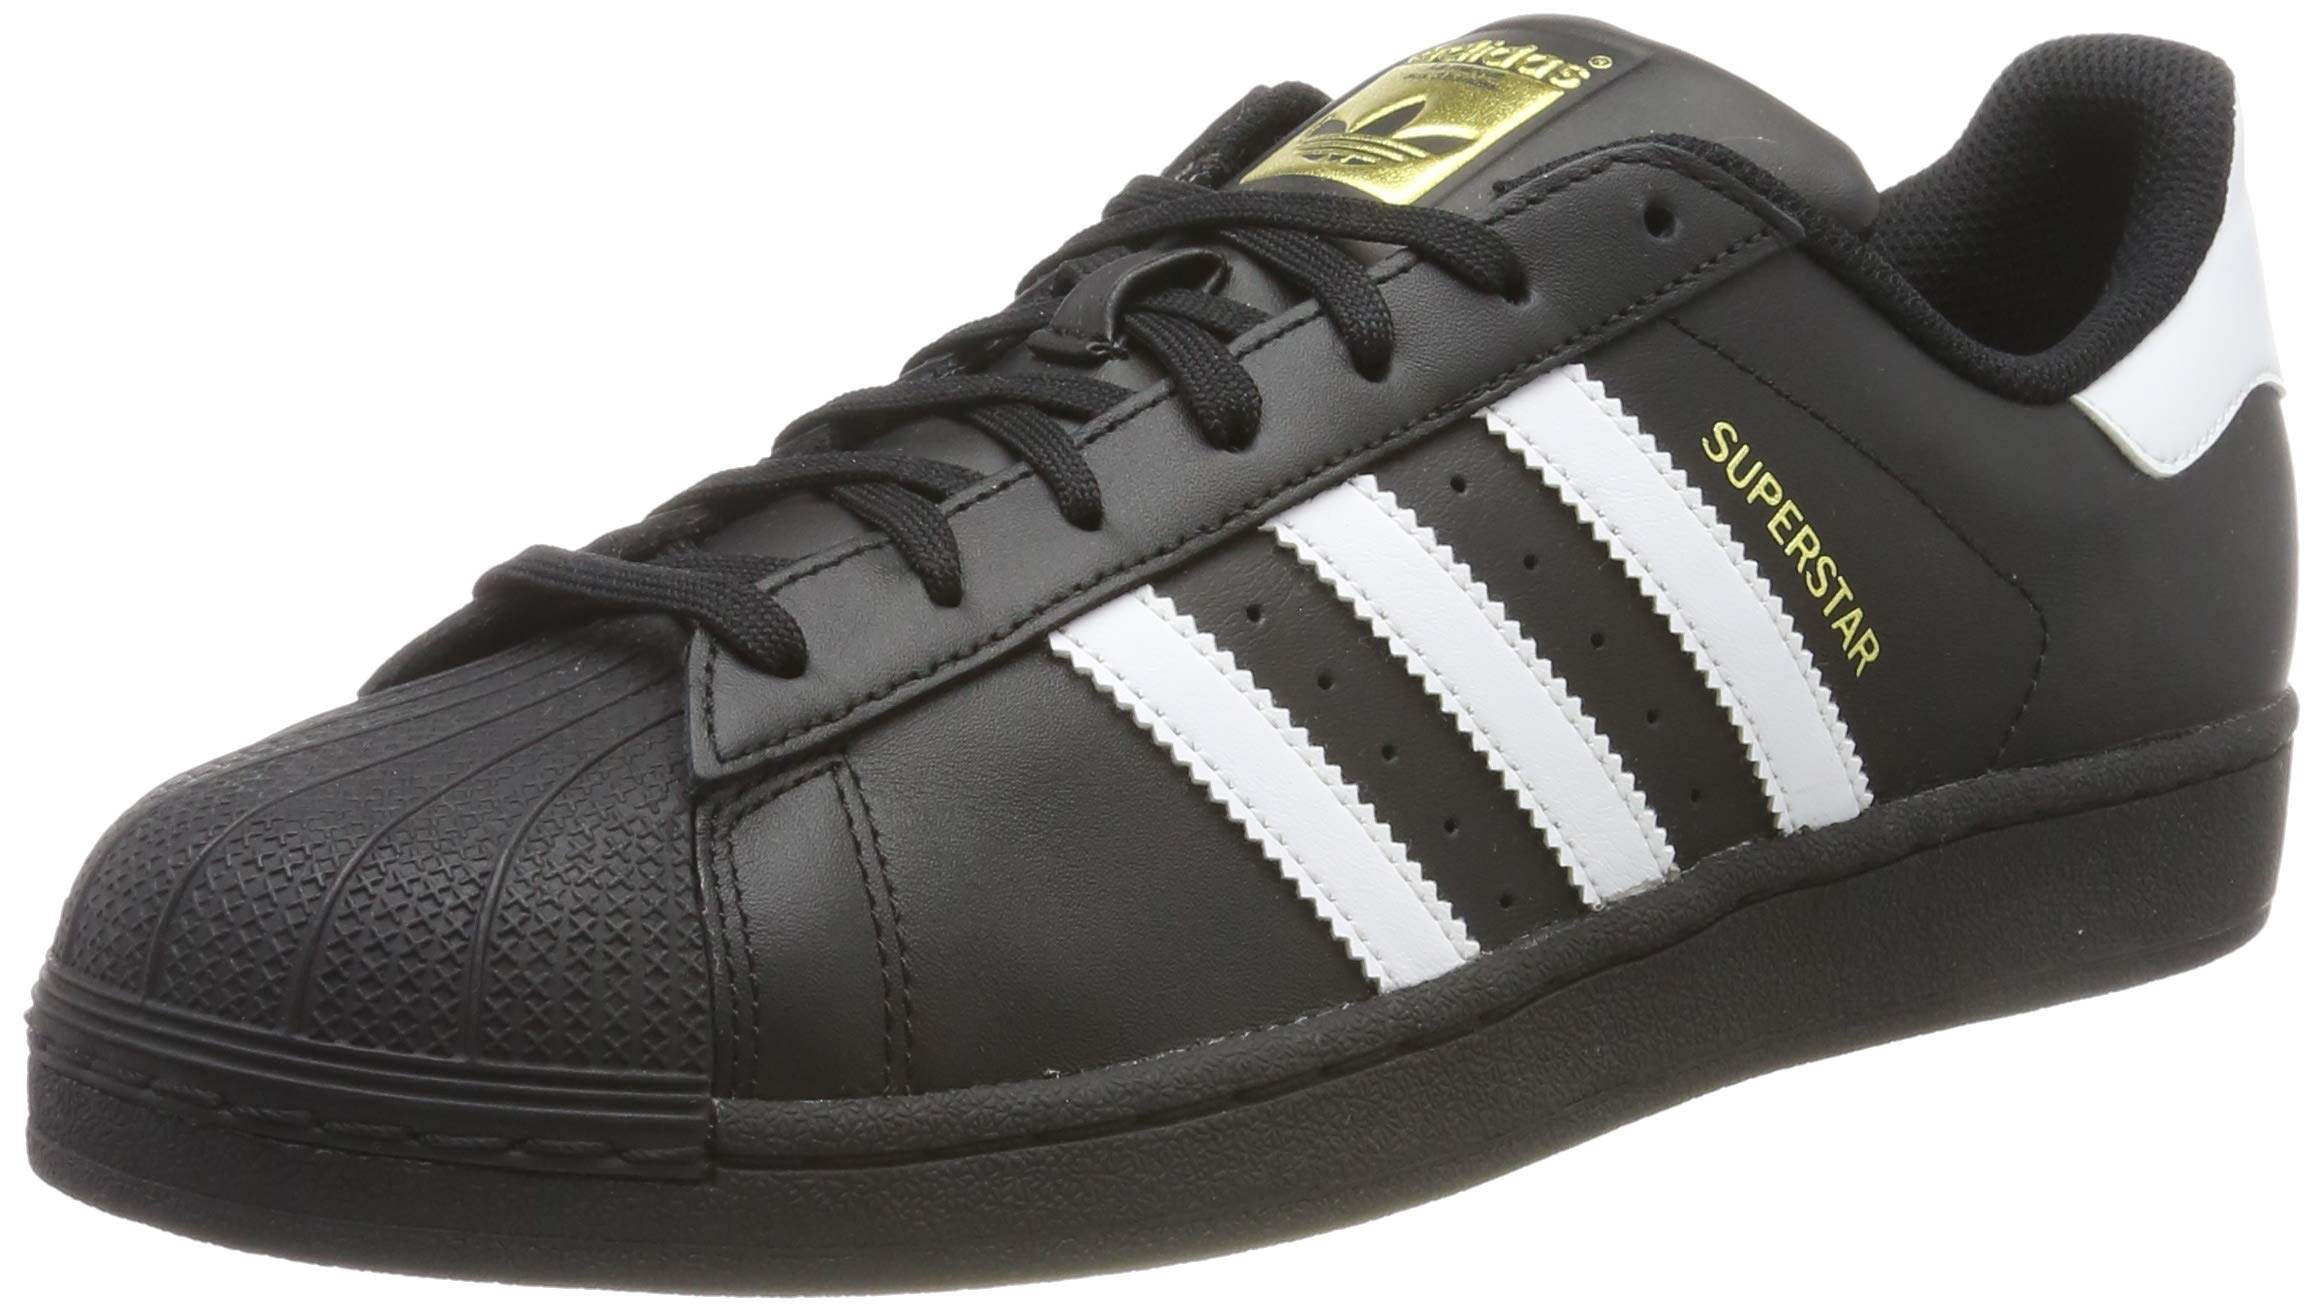 pretty nice 36c93 dd287 Adidas Original Superstar Sneakers for Women, 6.5 UK - AQ3091